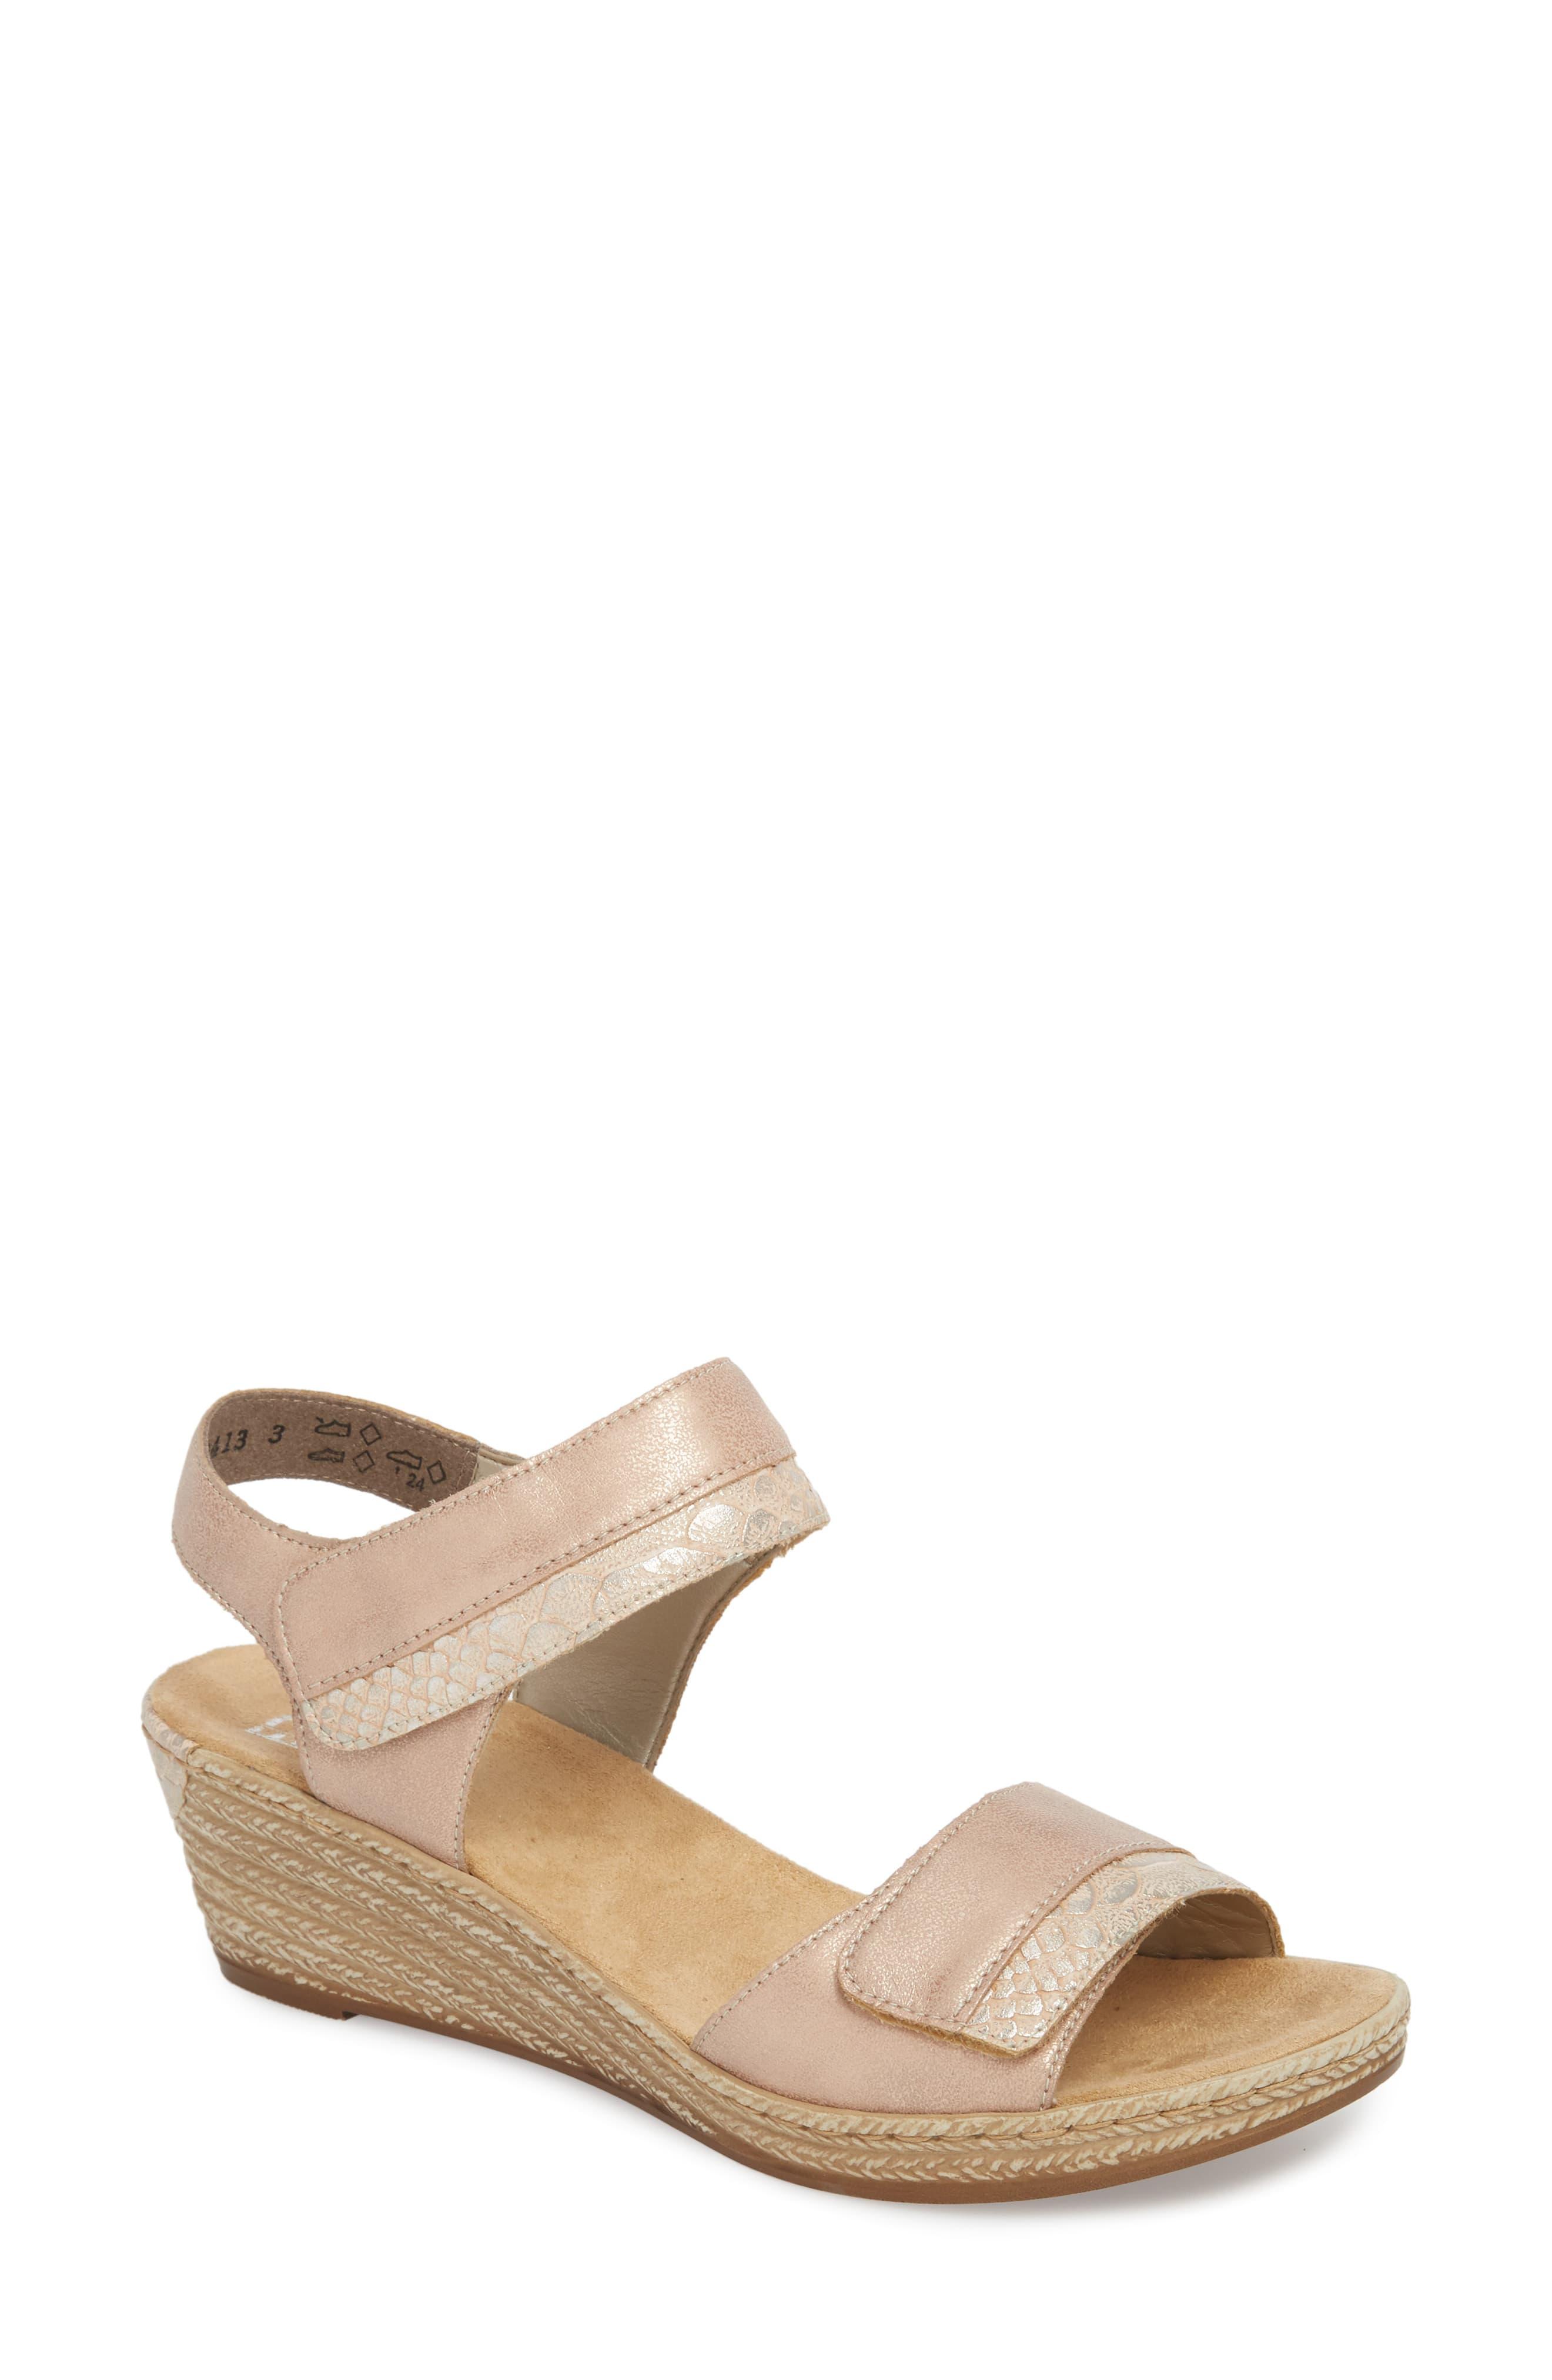 Rieker Antistress Fanni 70 Wedge Sandal (Women | Wedge